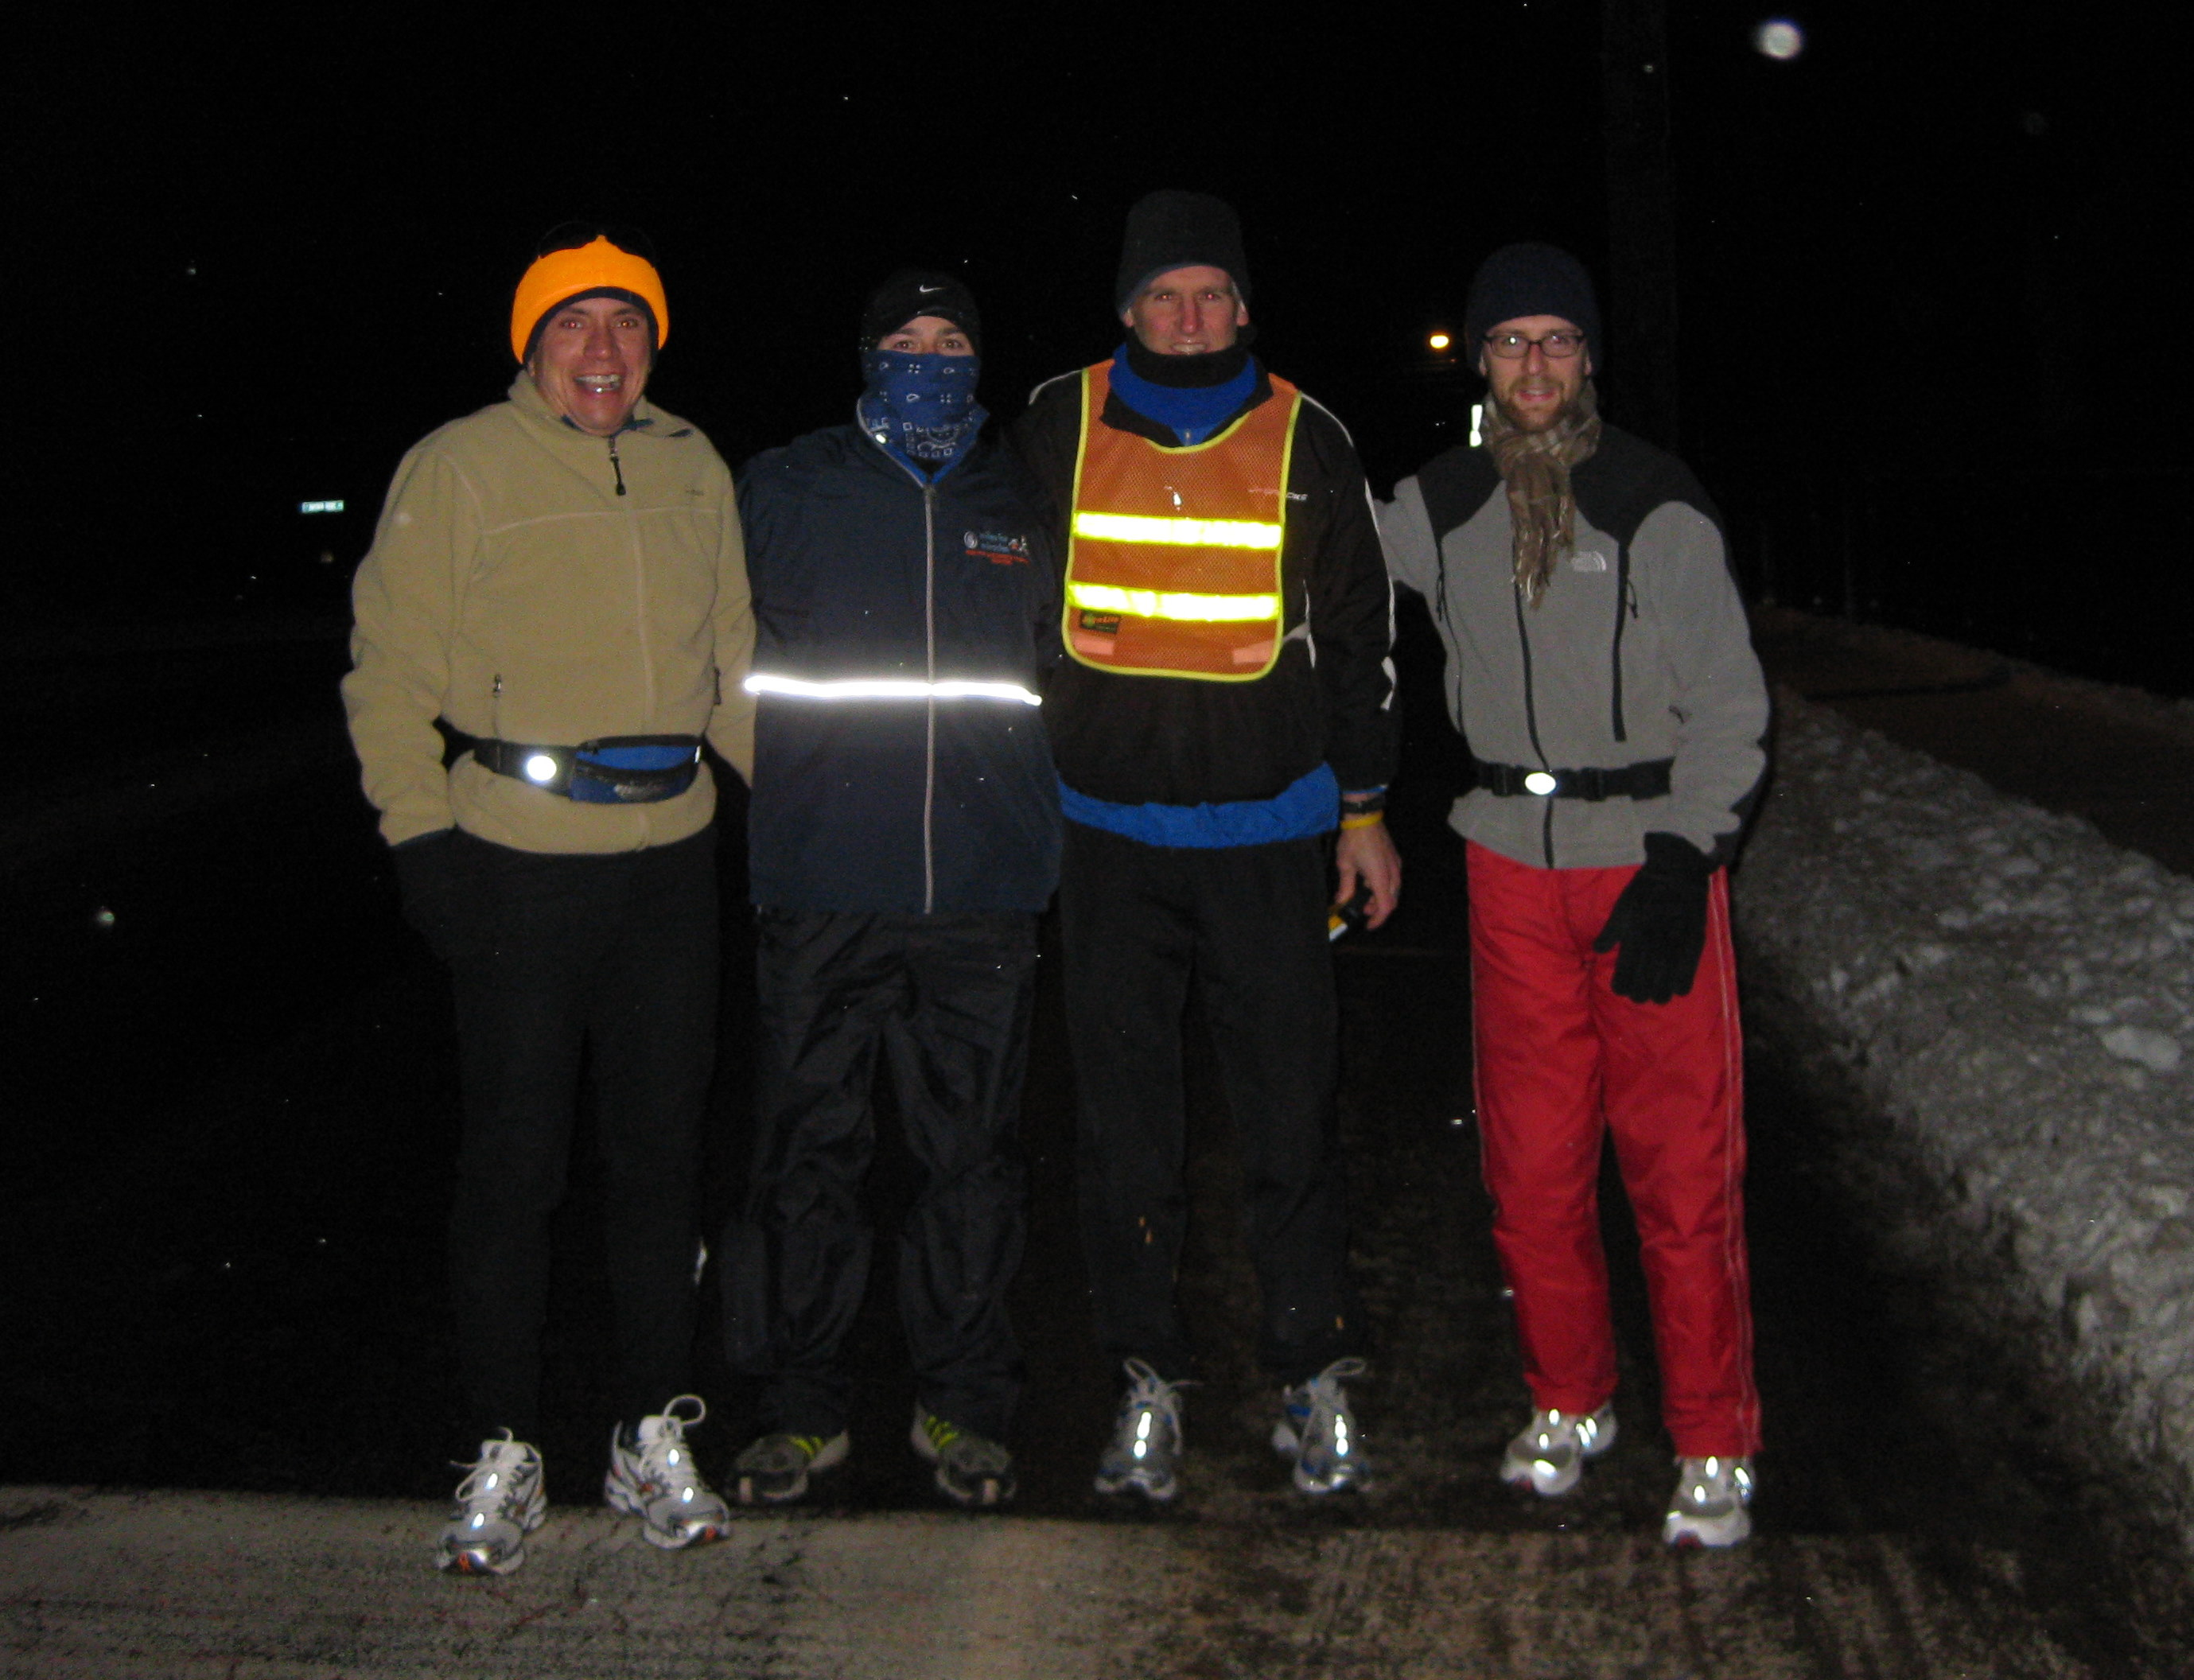 Me, Brandon, Gary, and Ned